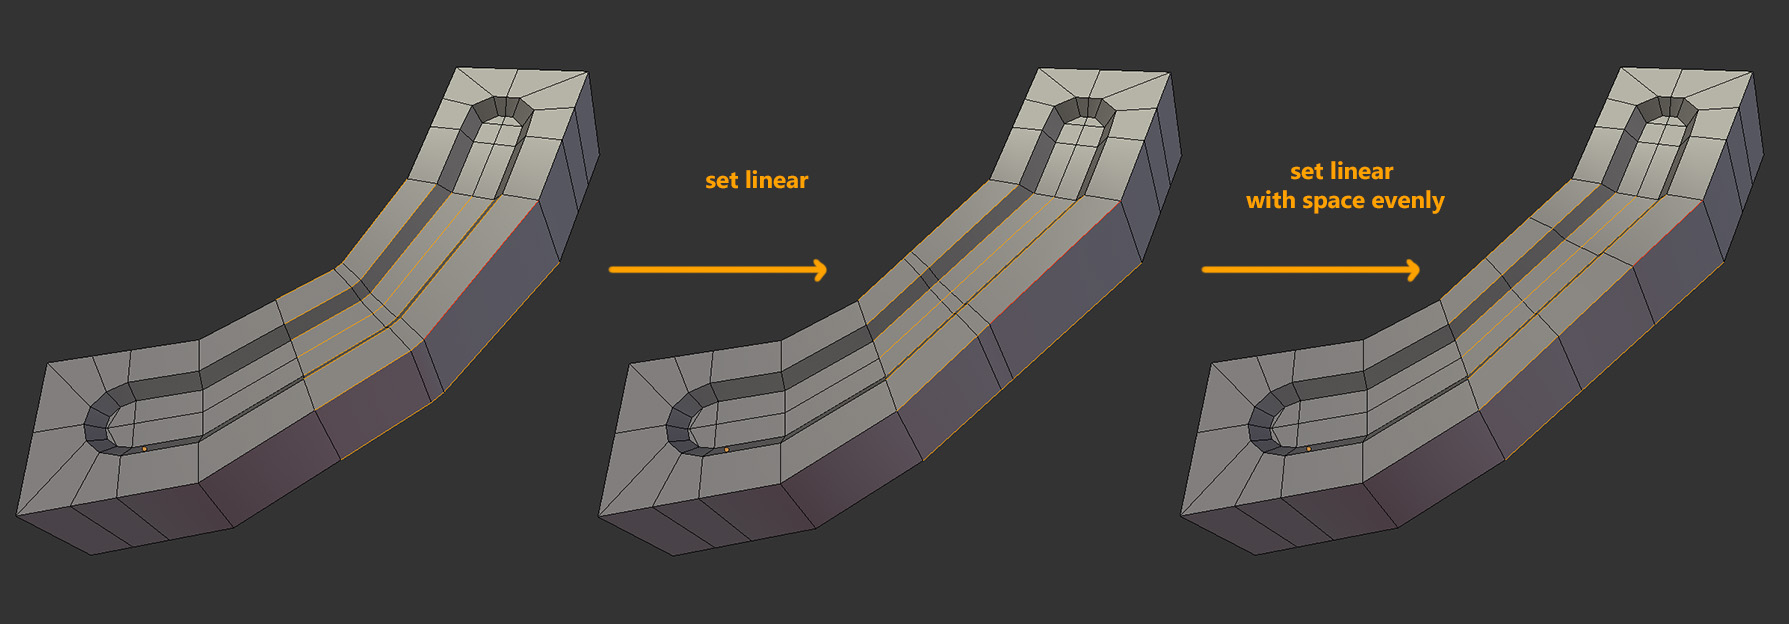 Set_Linear_Demo2